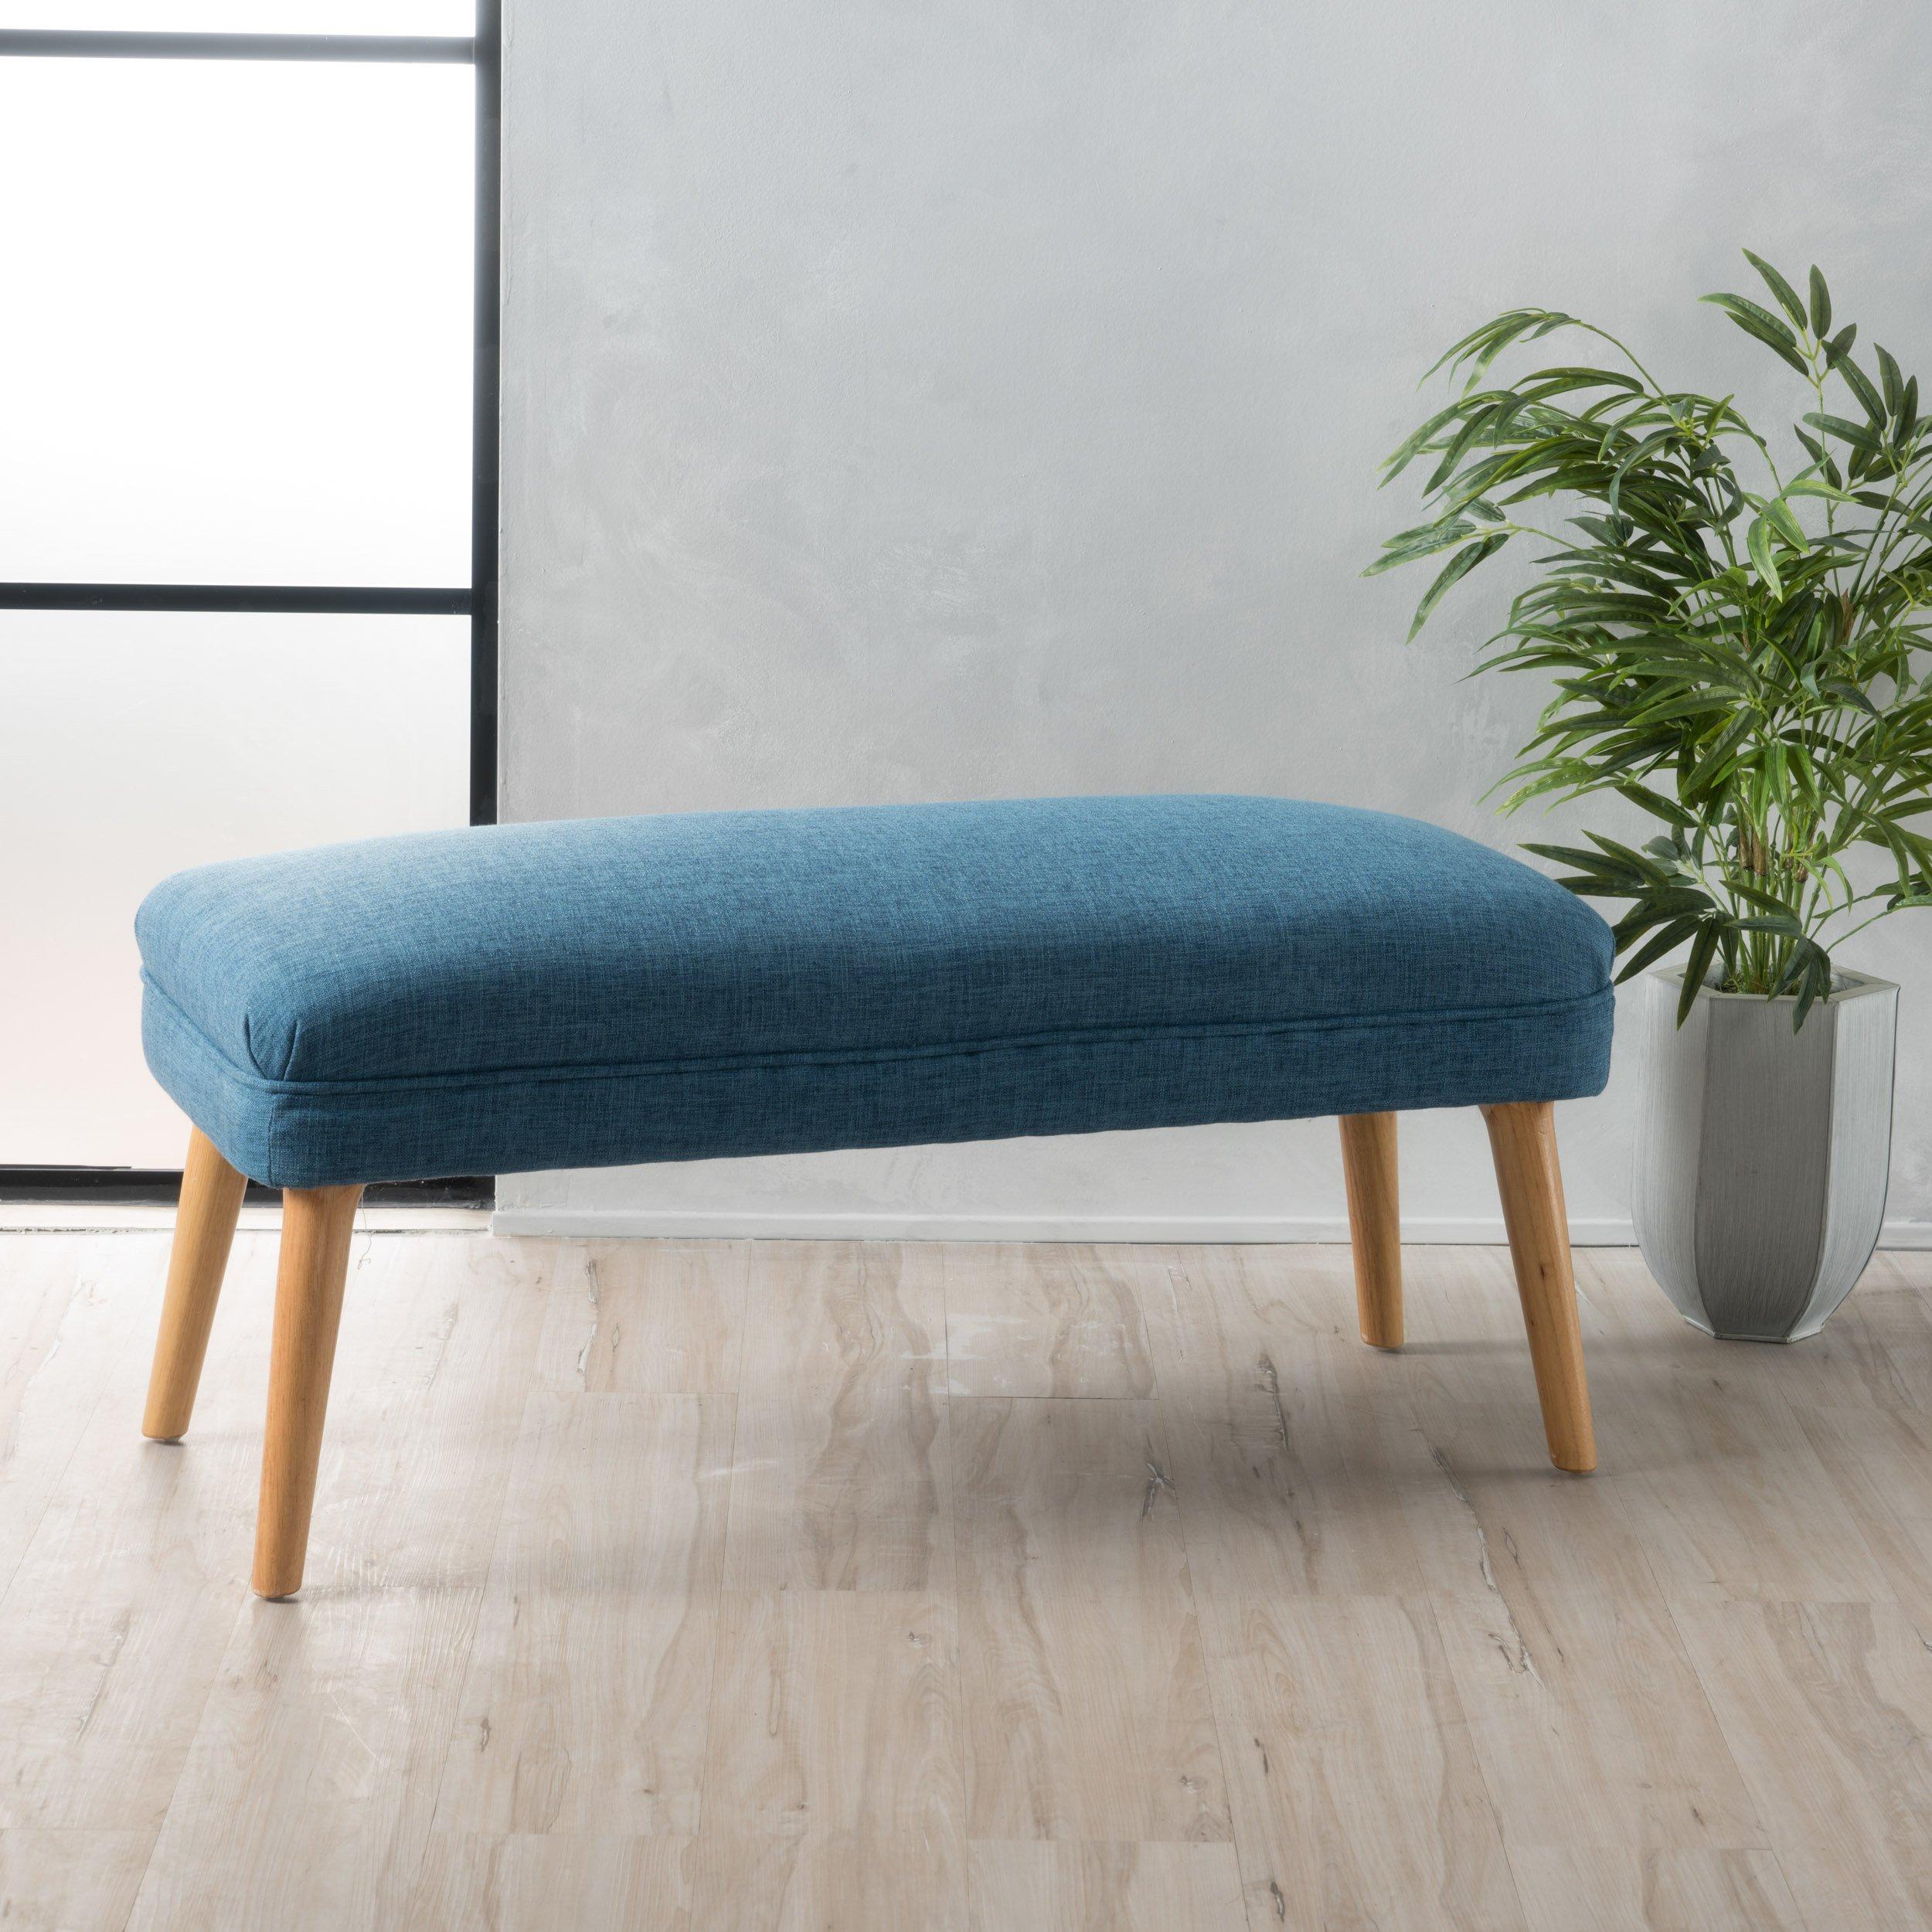 Dumont Mid Century Modern Fabric Ottoman (Blue) by GDF Studio (Image #1)